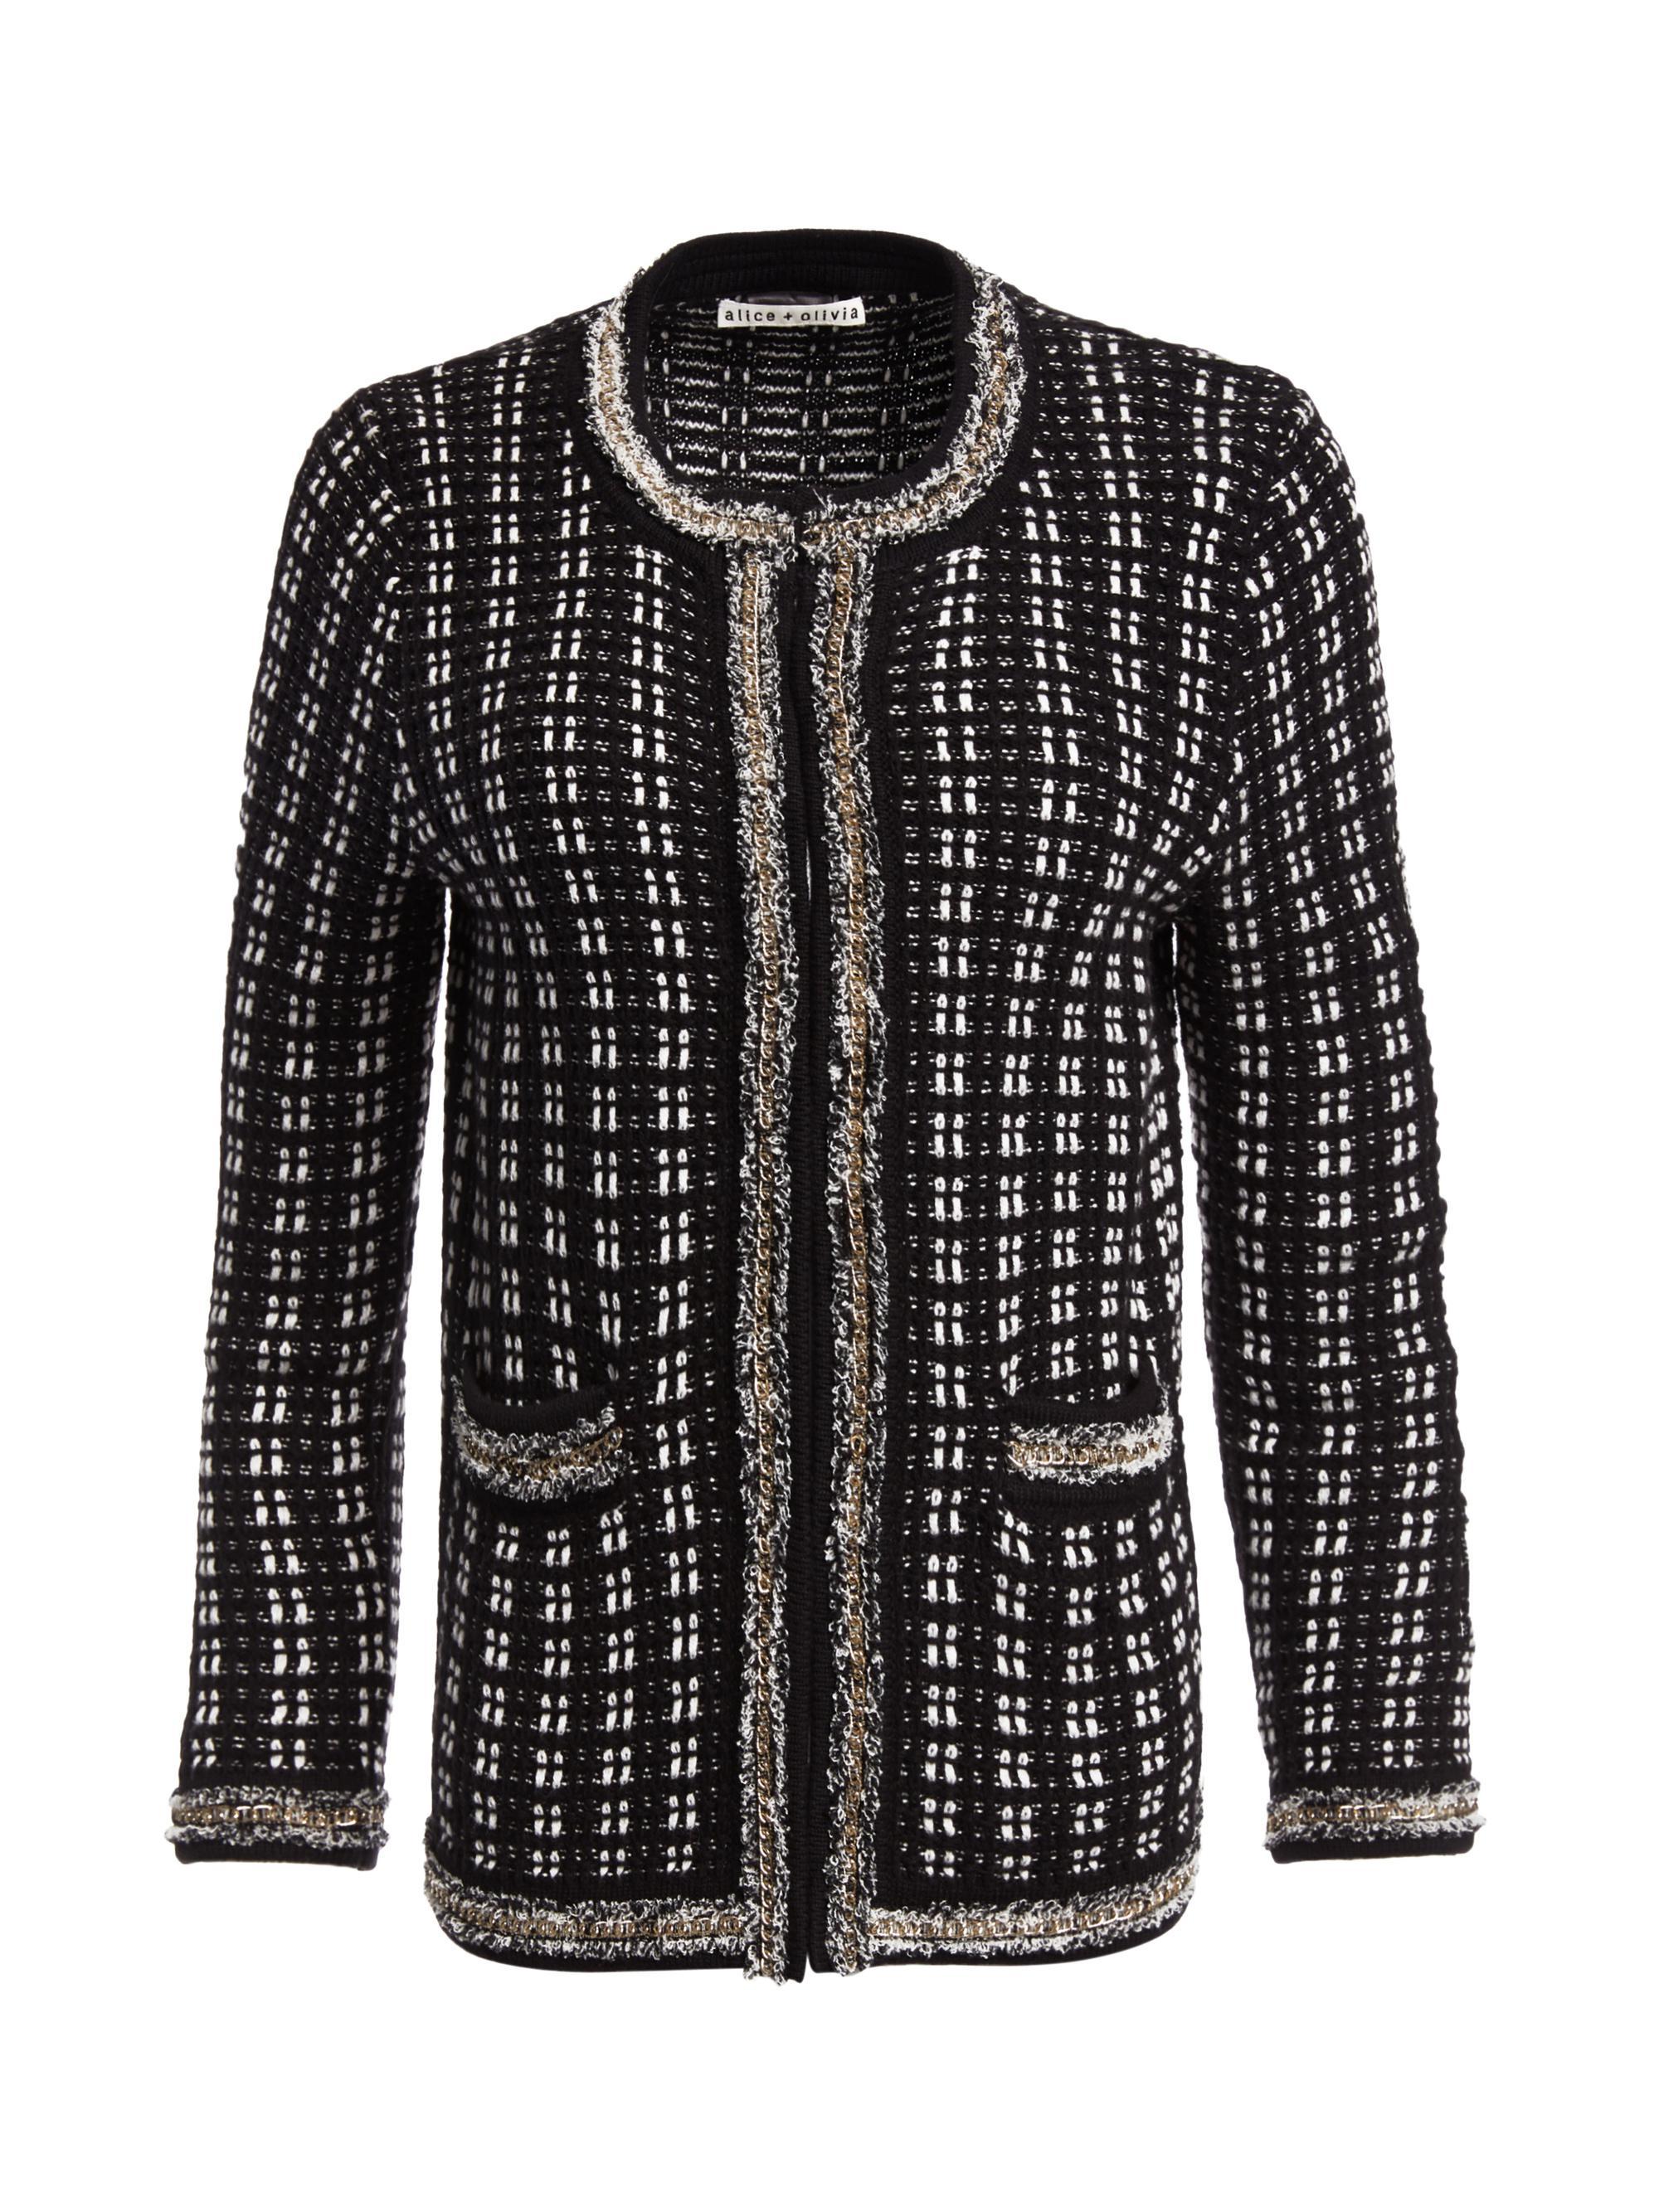 Lyst - Alice + Olivia Georgia Gold Chain Sweater Jacket in Black af3750933